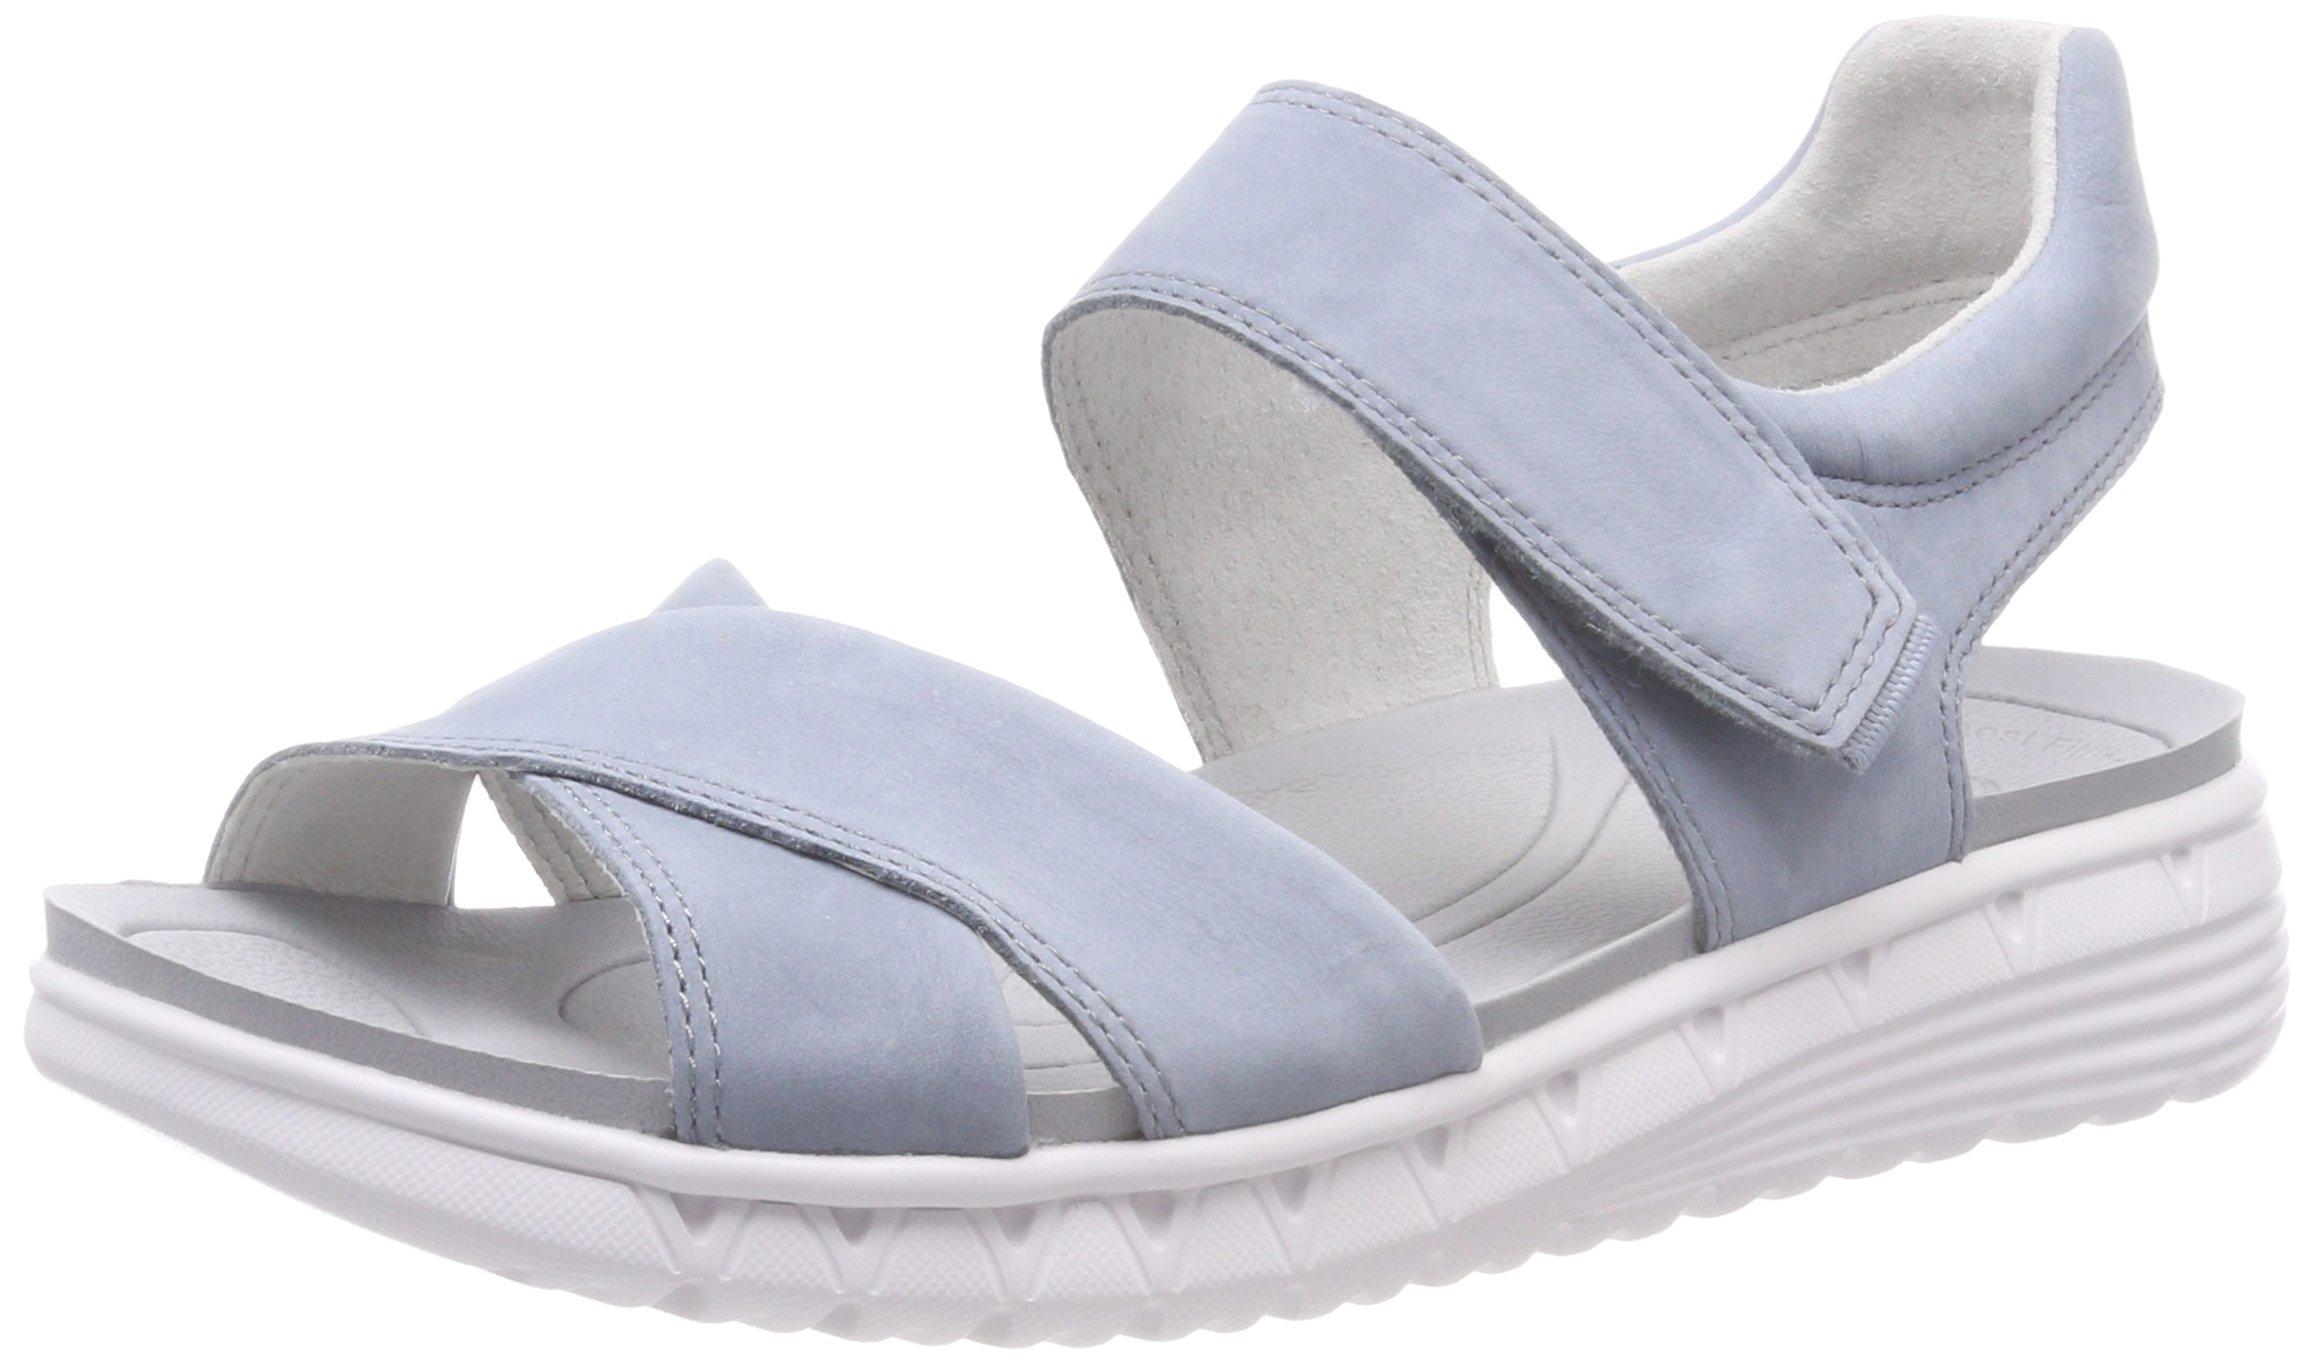 Gabor Cheville SportSandales FemmeBleucielo39 Shoes Eu Bride wkuiTXZPO